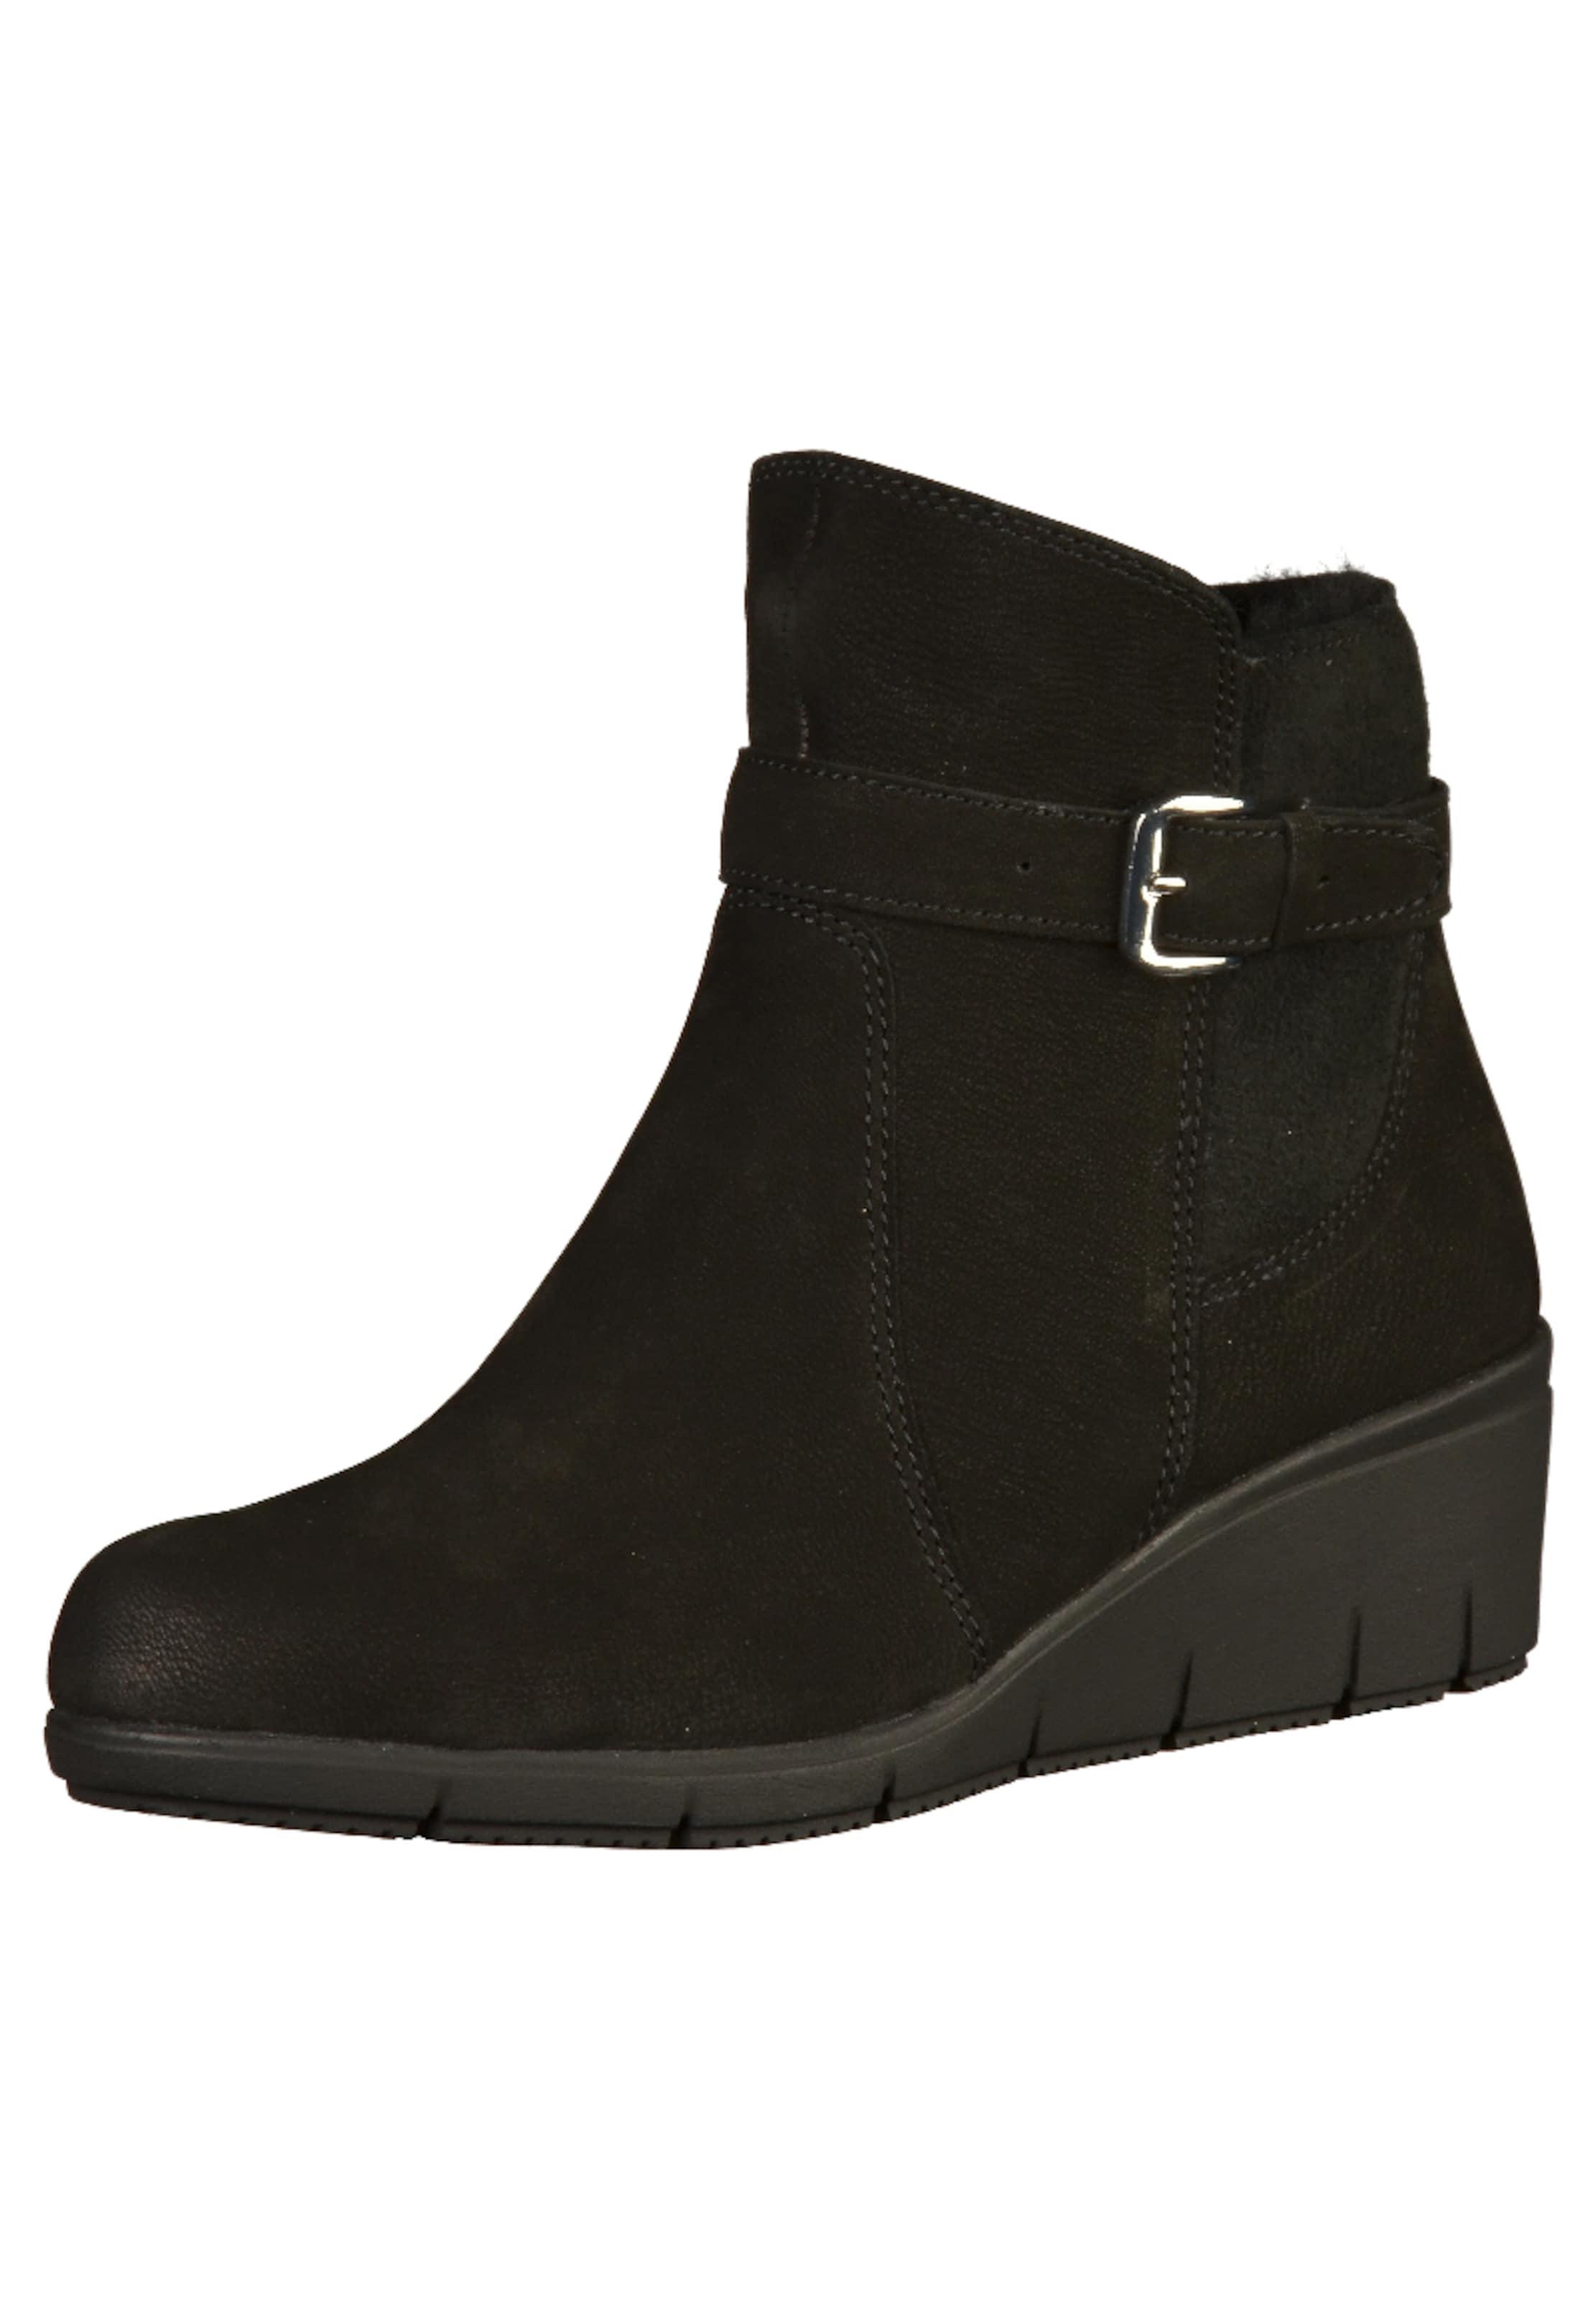 Haltbare Mode billige Schuhe CAPRICE | Stiefelette Schuhe Gut getragene Schuhe